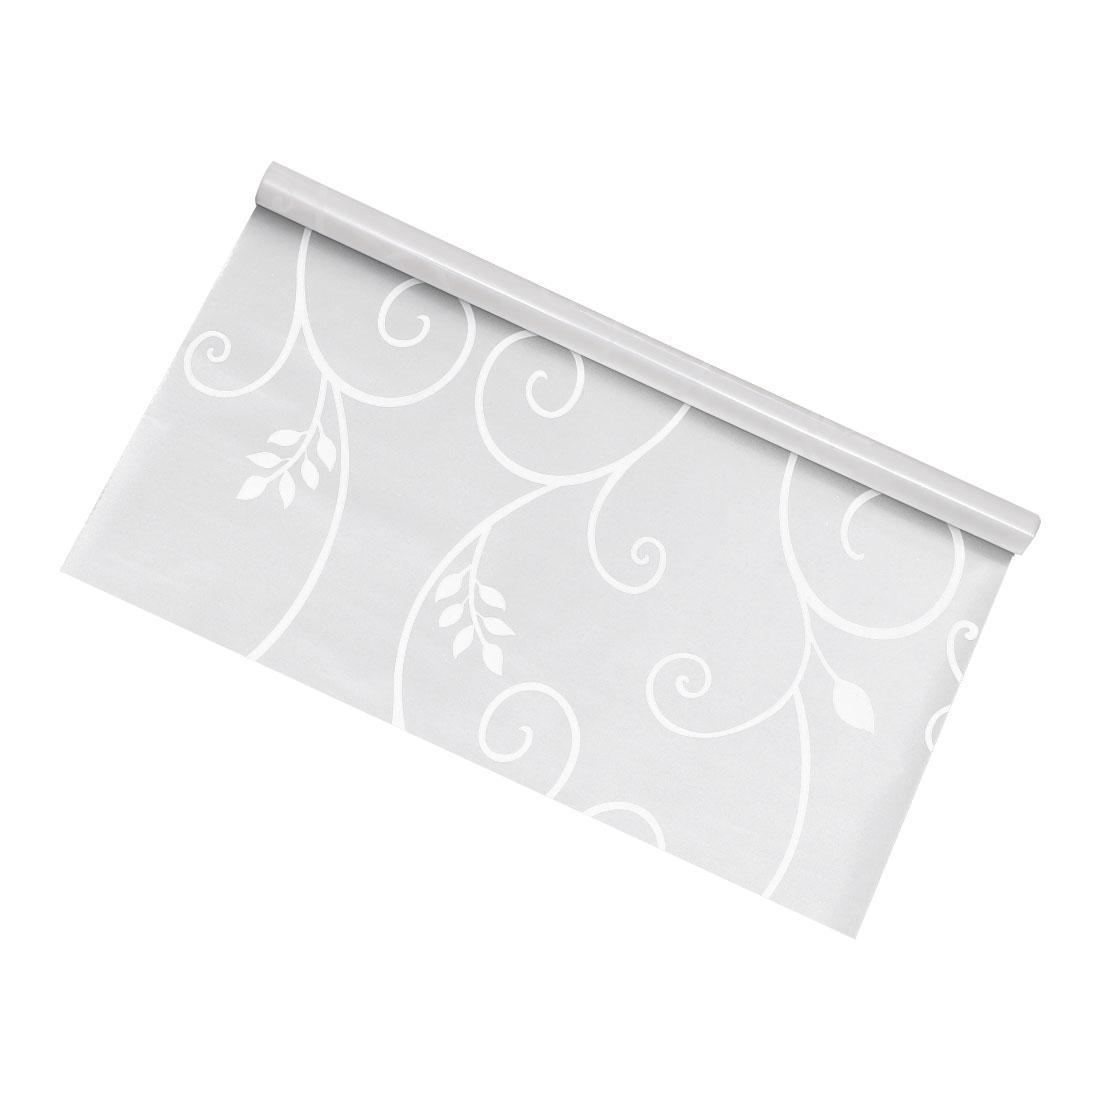 PVC 78.7 x 17.7 Inch Anti UV Window Film Sticker White Flower Vine